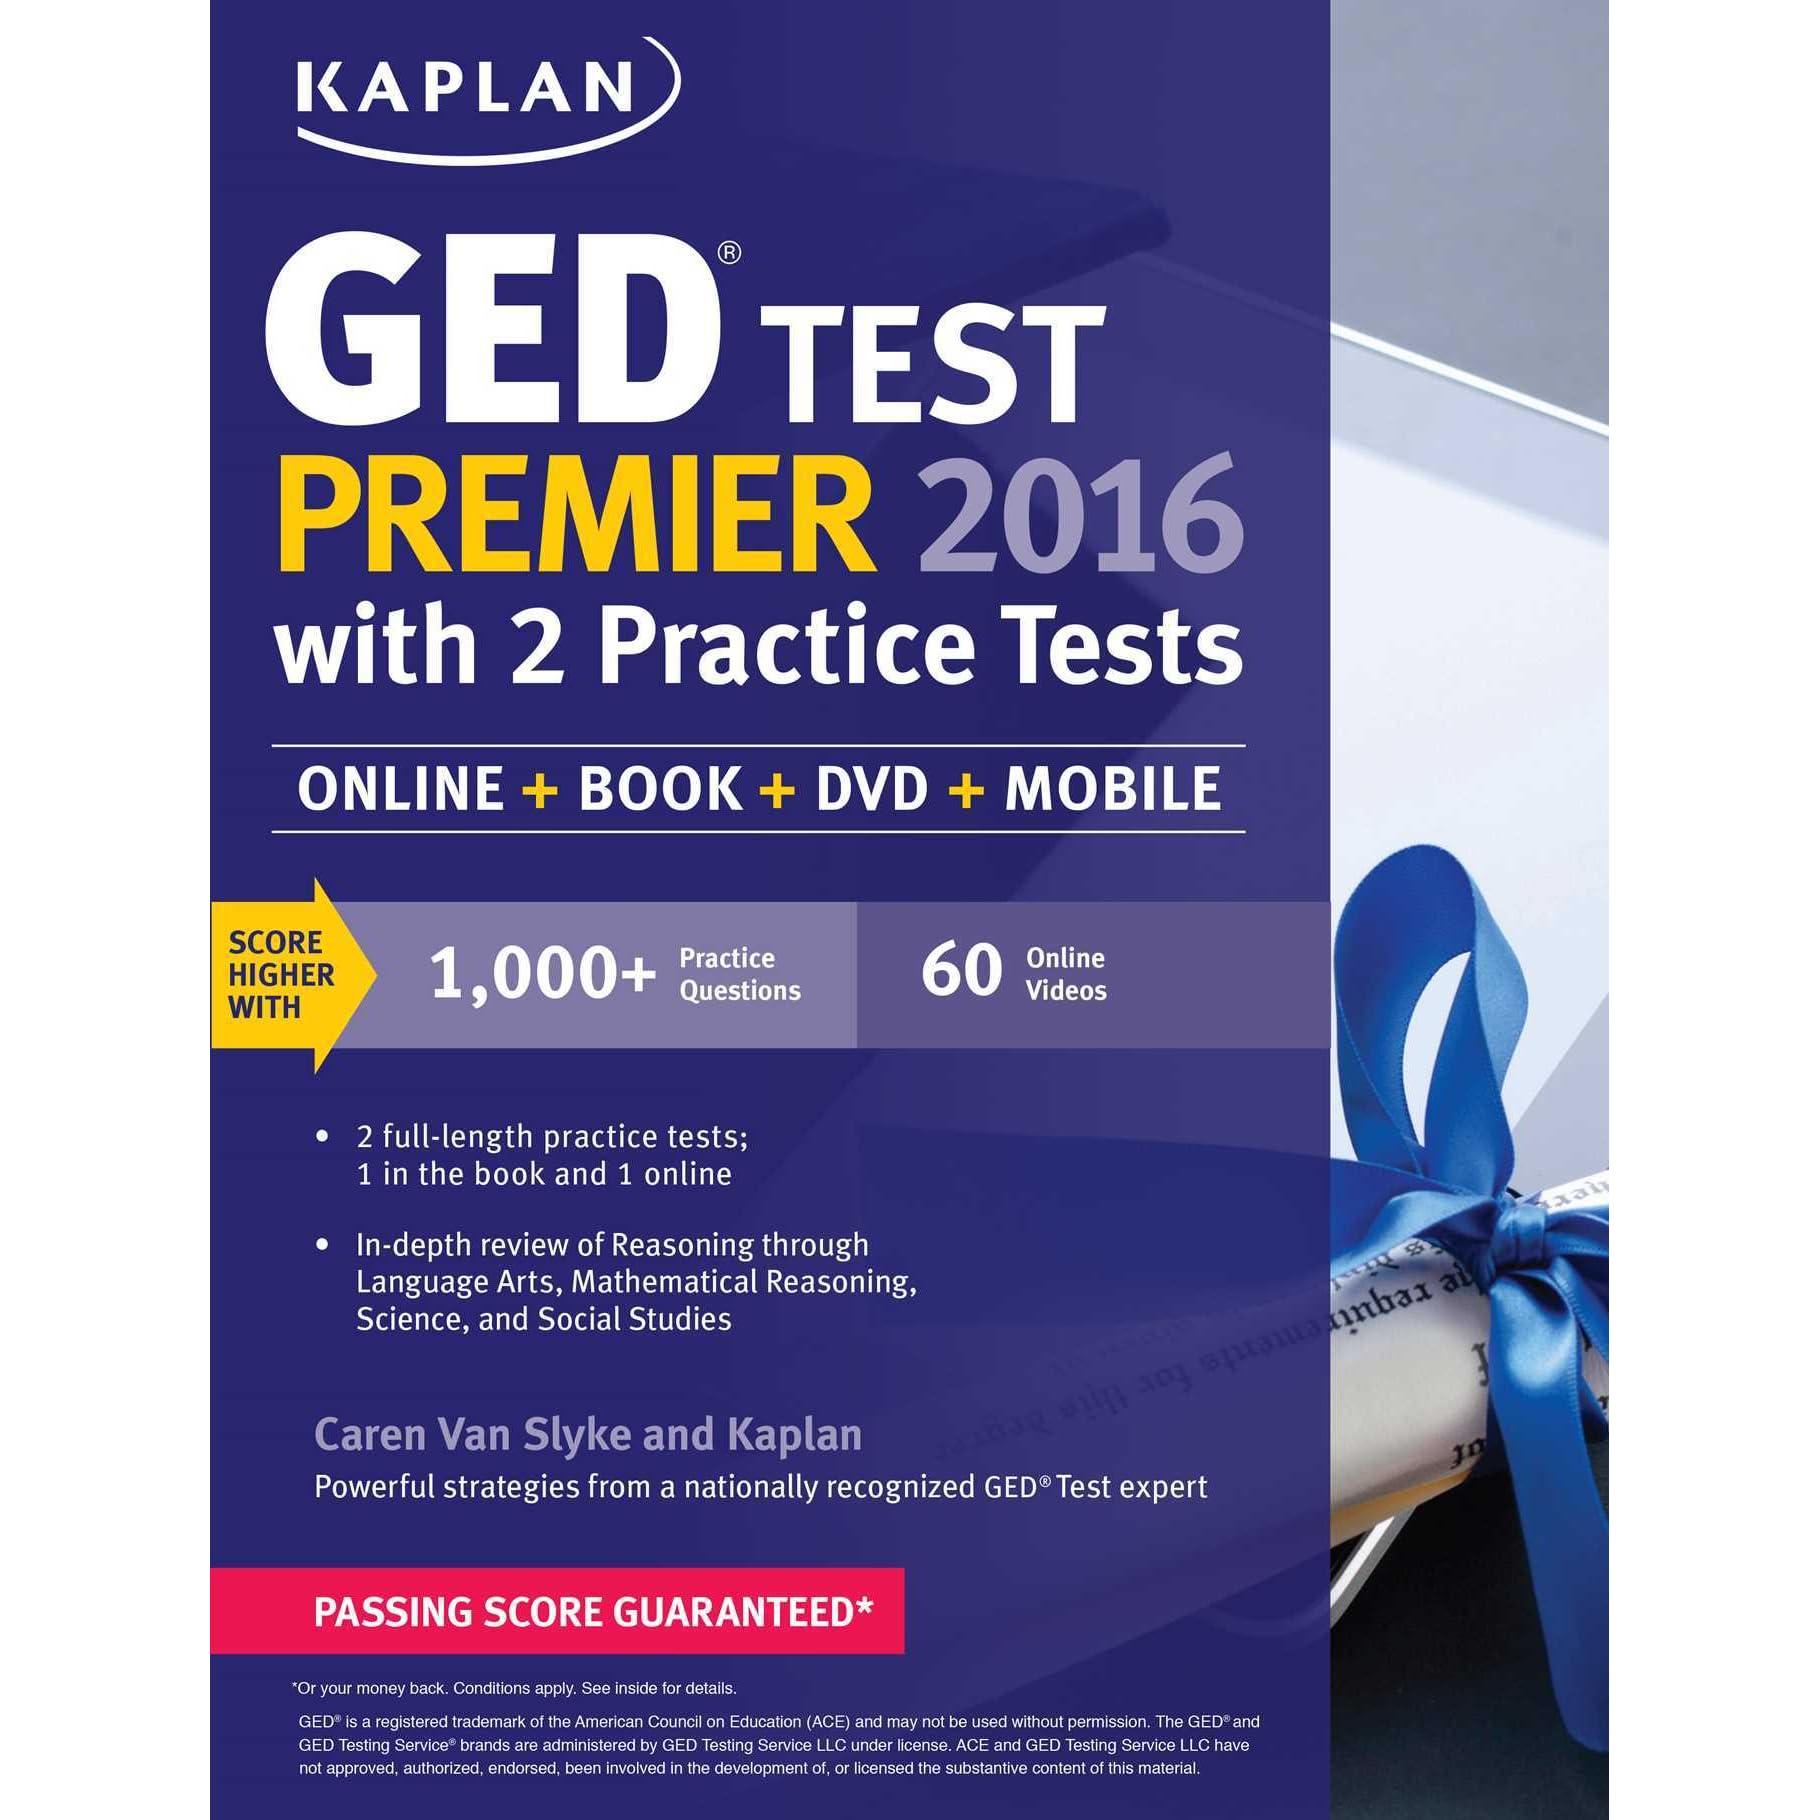 Kaplan Ged Test Premier With 2 Practice Tests Online Book Videos Mobile By Caren Van